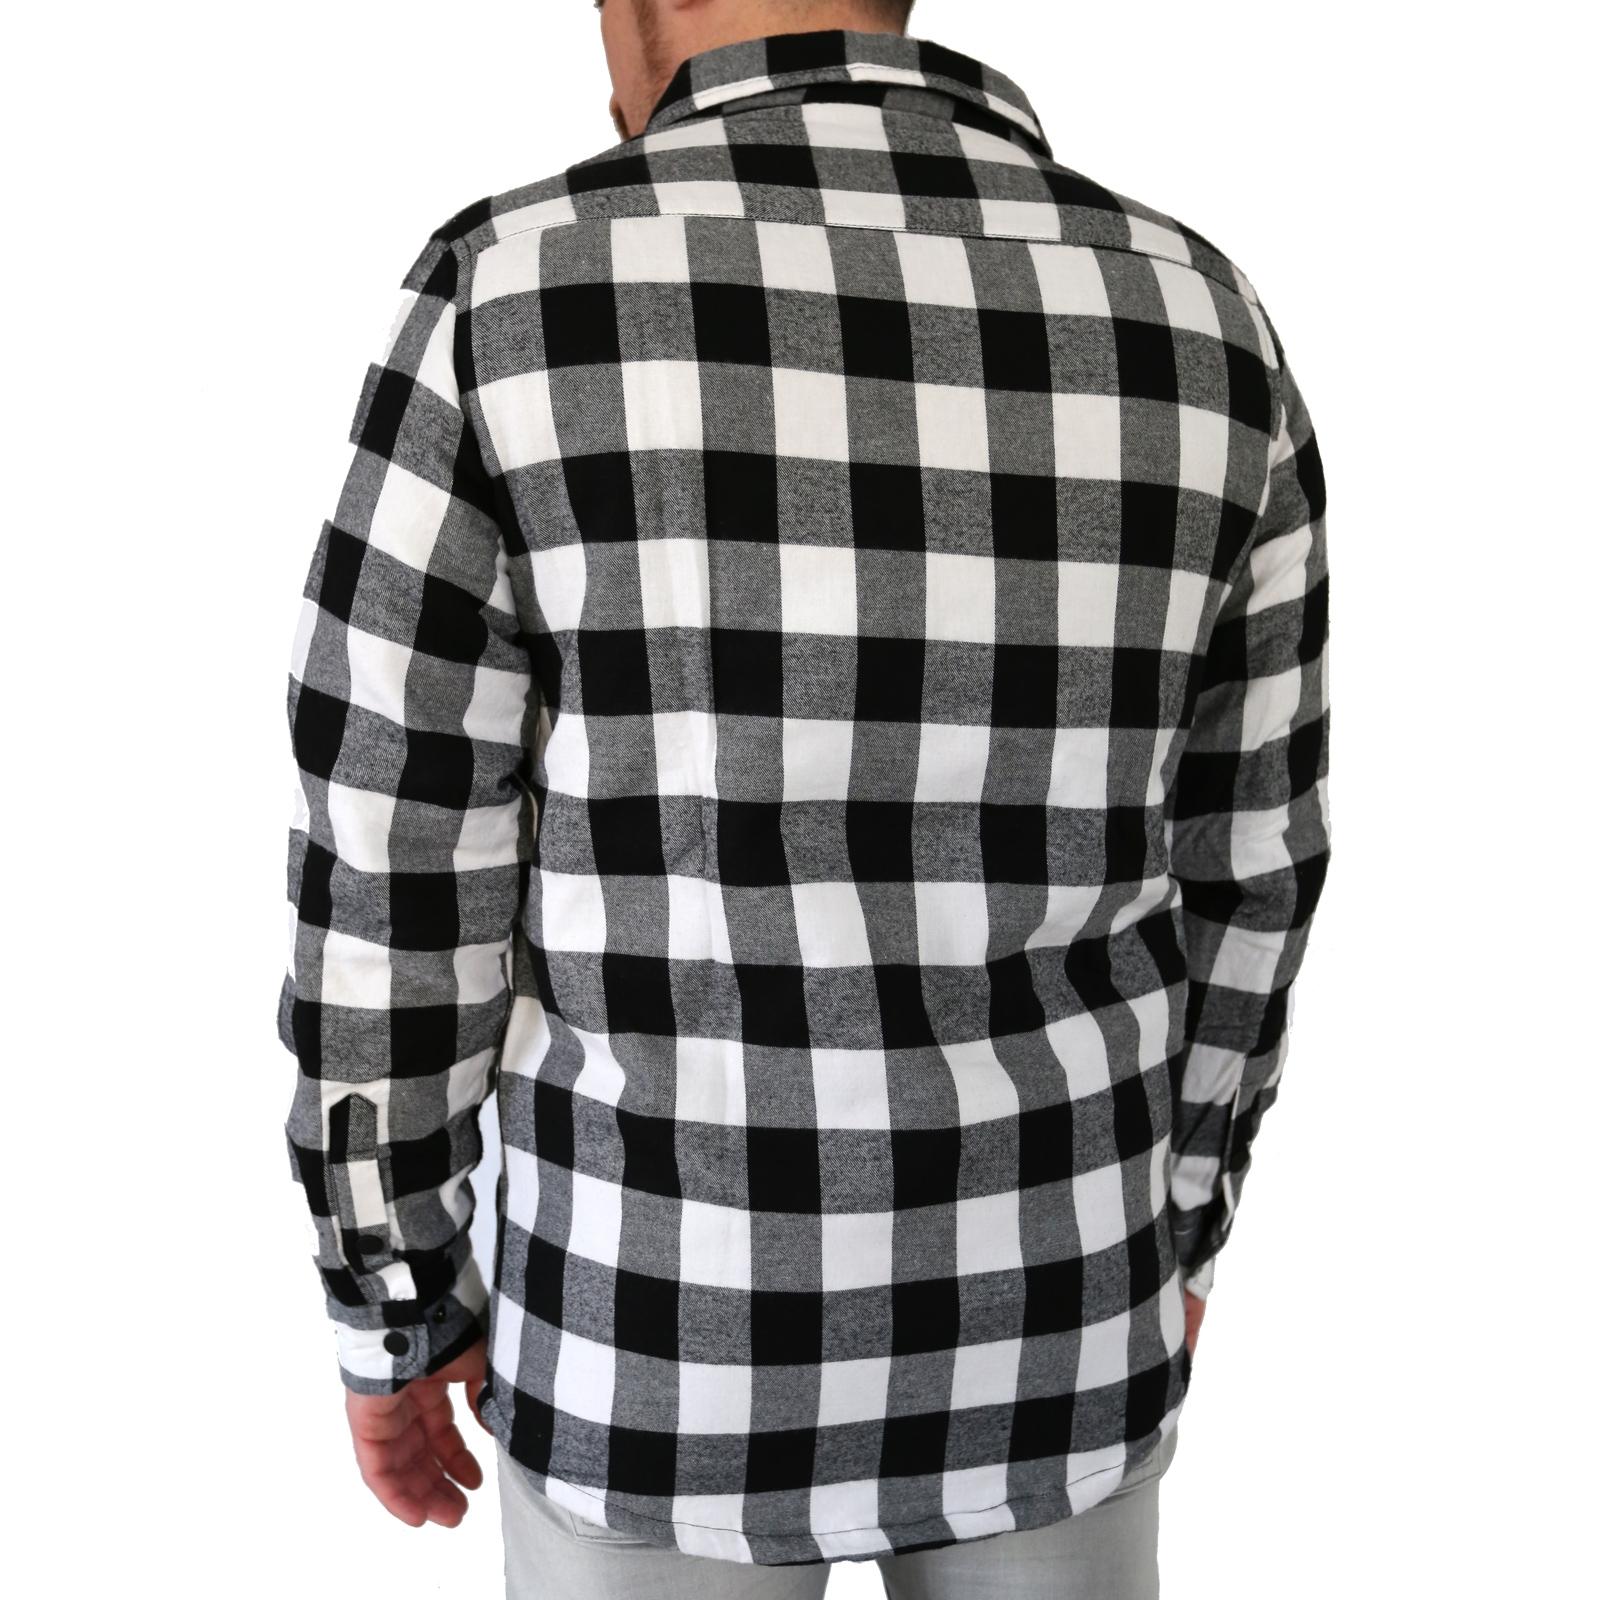 Squarejacket white